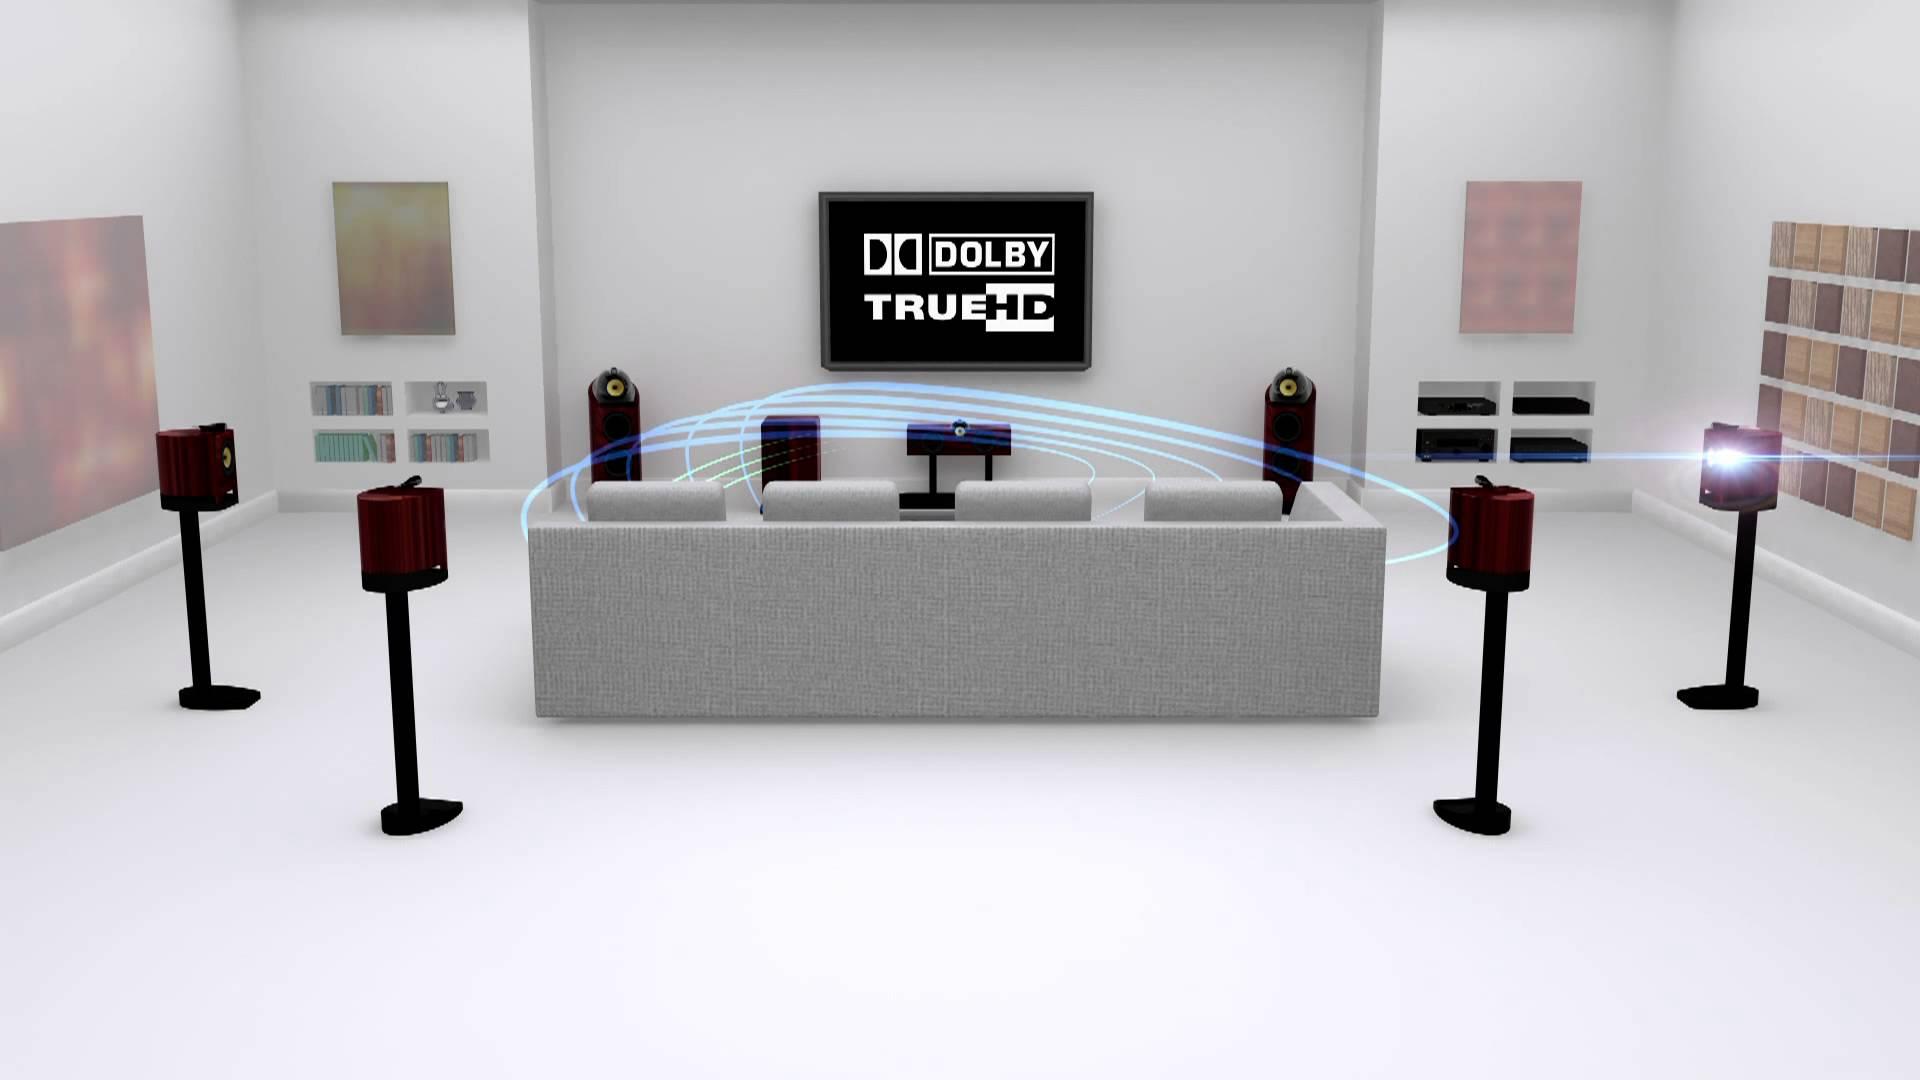 True Dolby